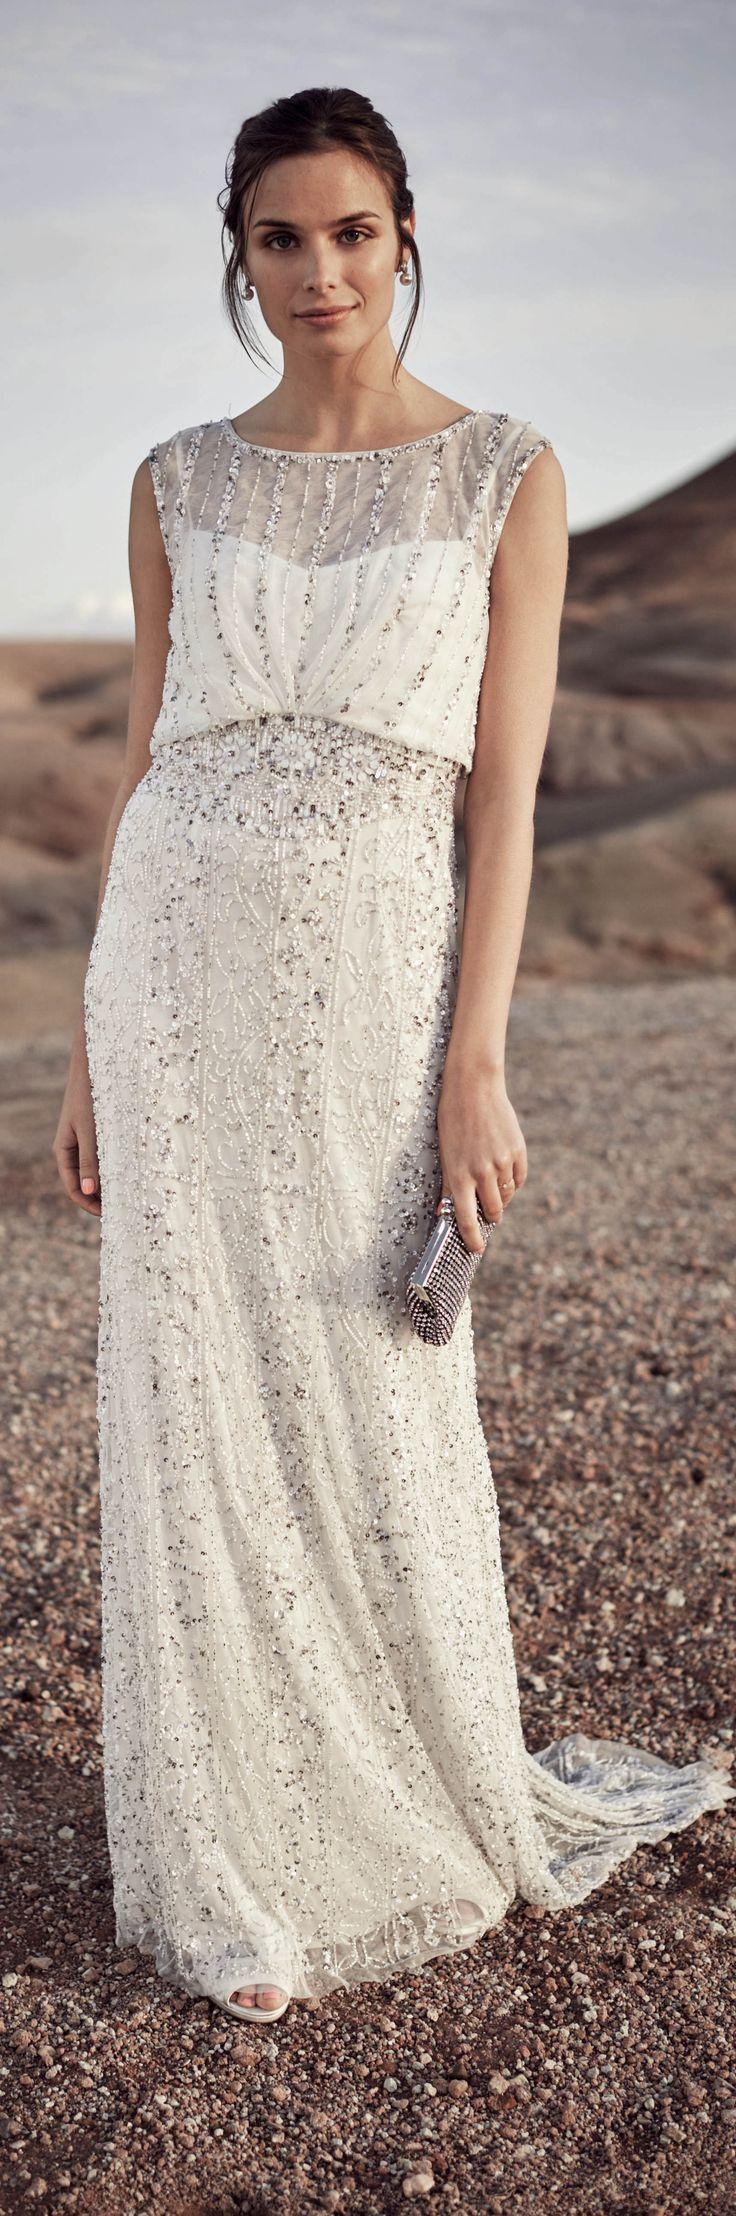 best wedding dress images on pinterest bridal gowns short